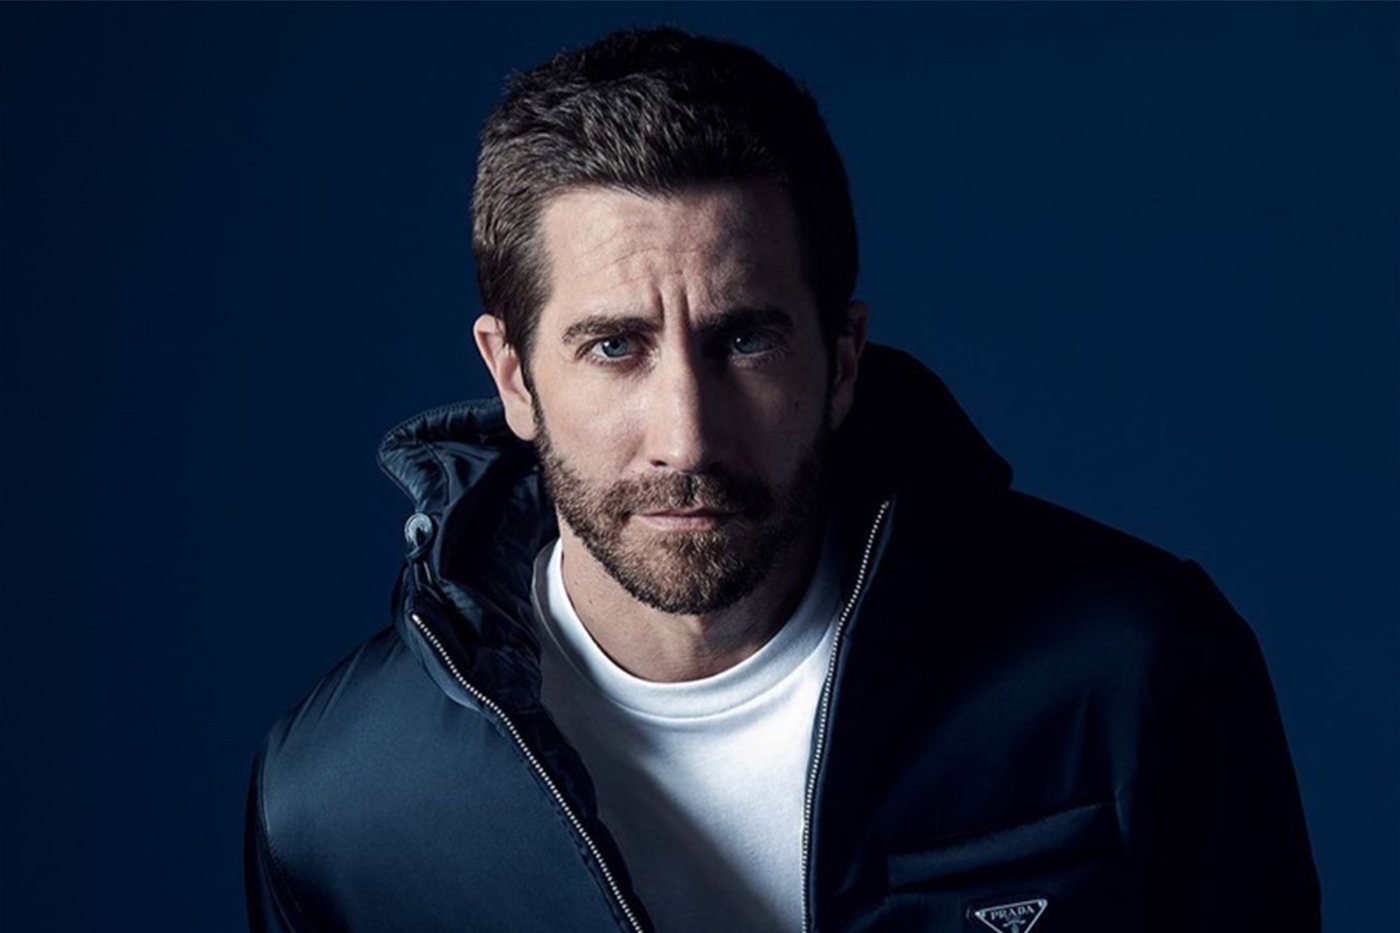 Jake Gyllenhaal features in Prada's Luna Rossa Ocean fragrance ad film